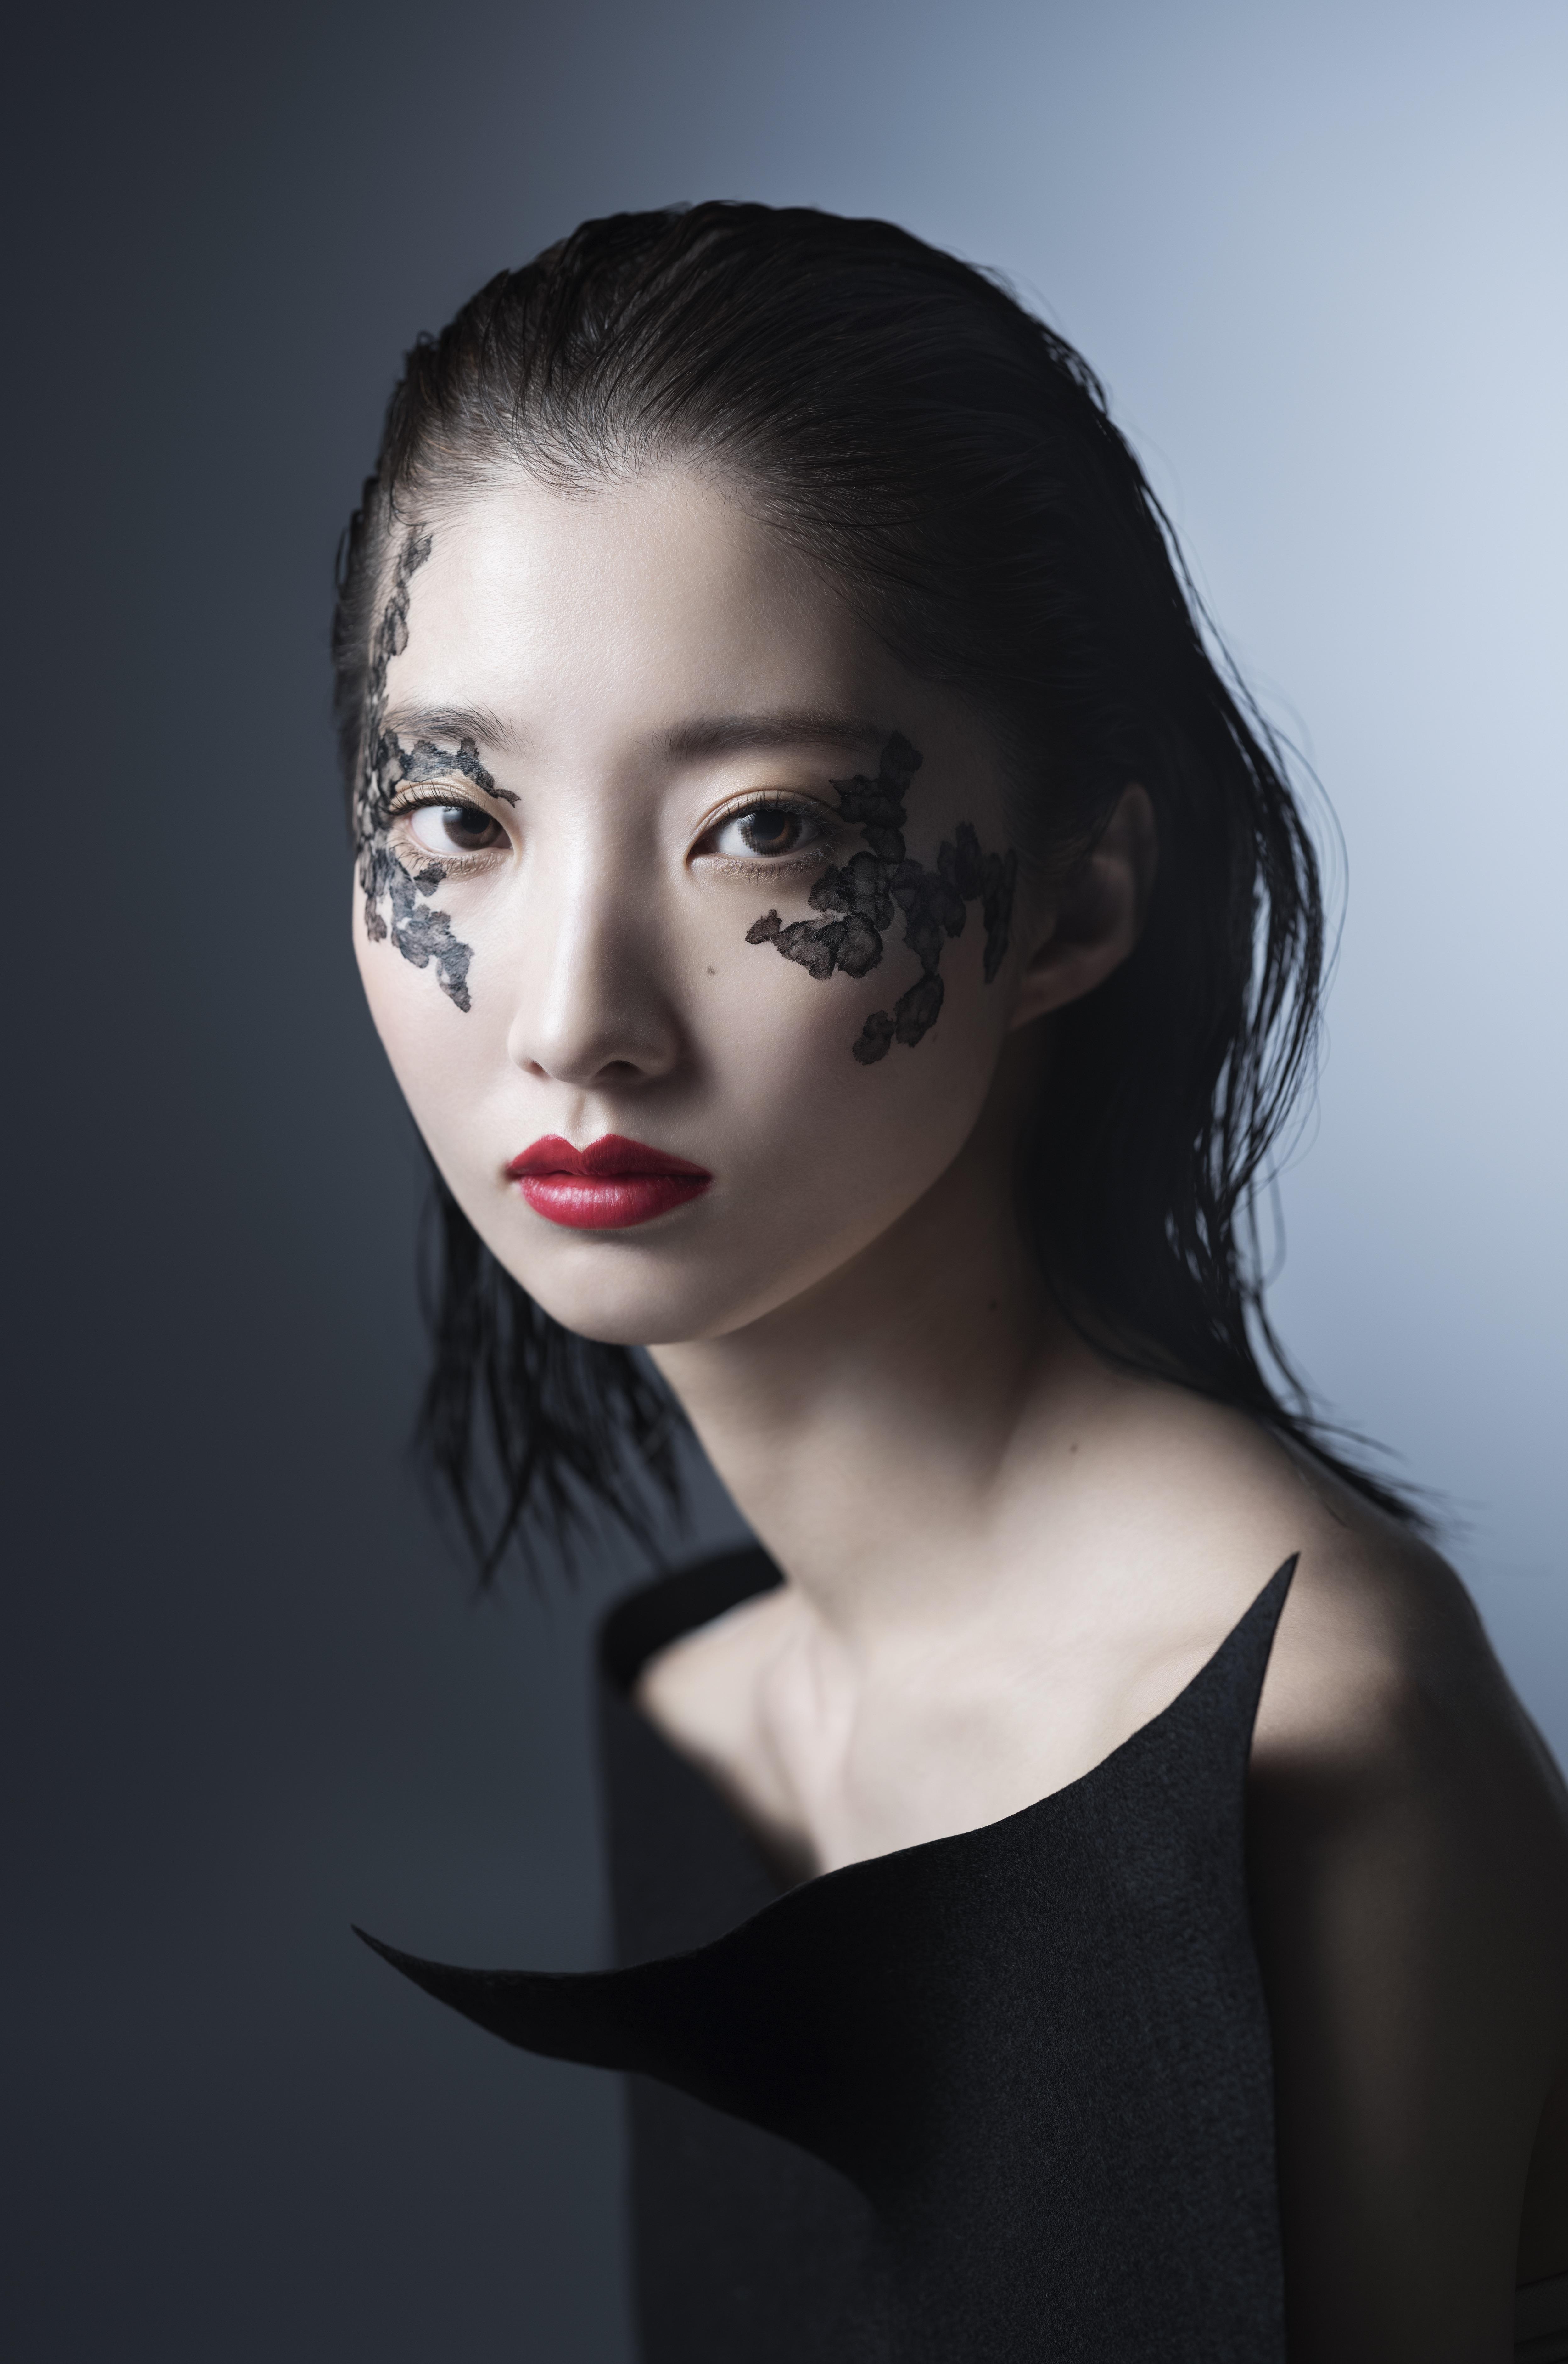 飯島望未 Photo: Kei Ogata